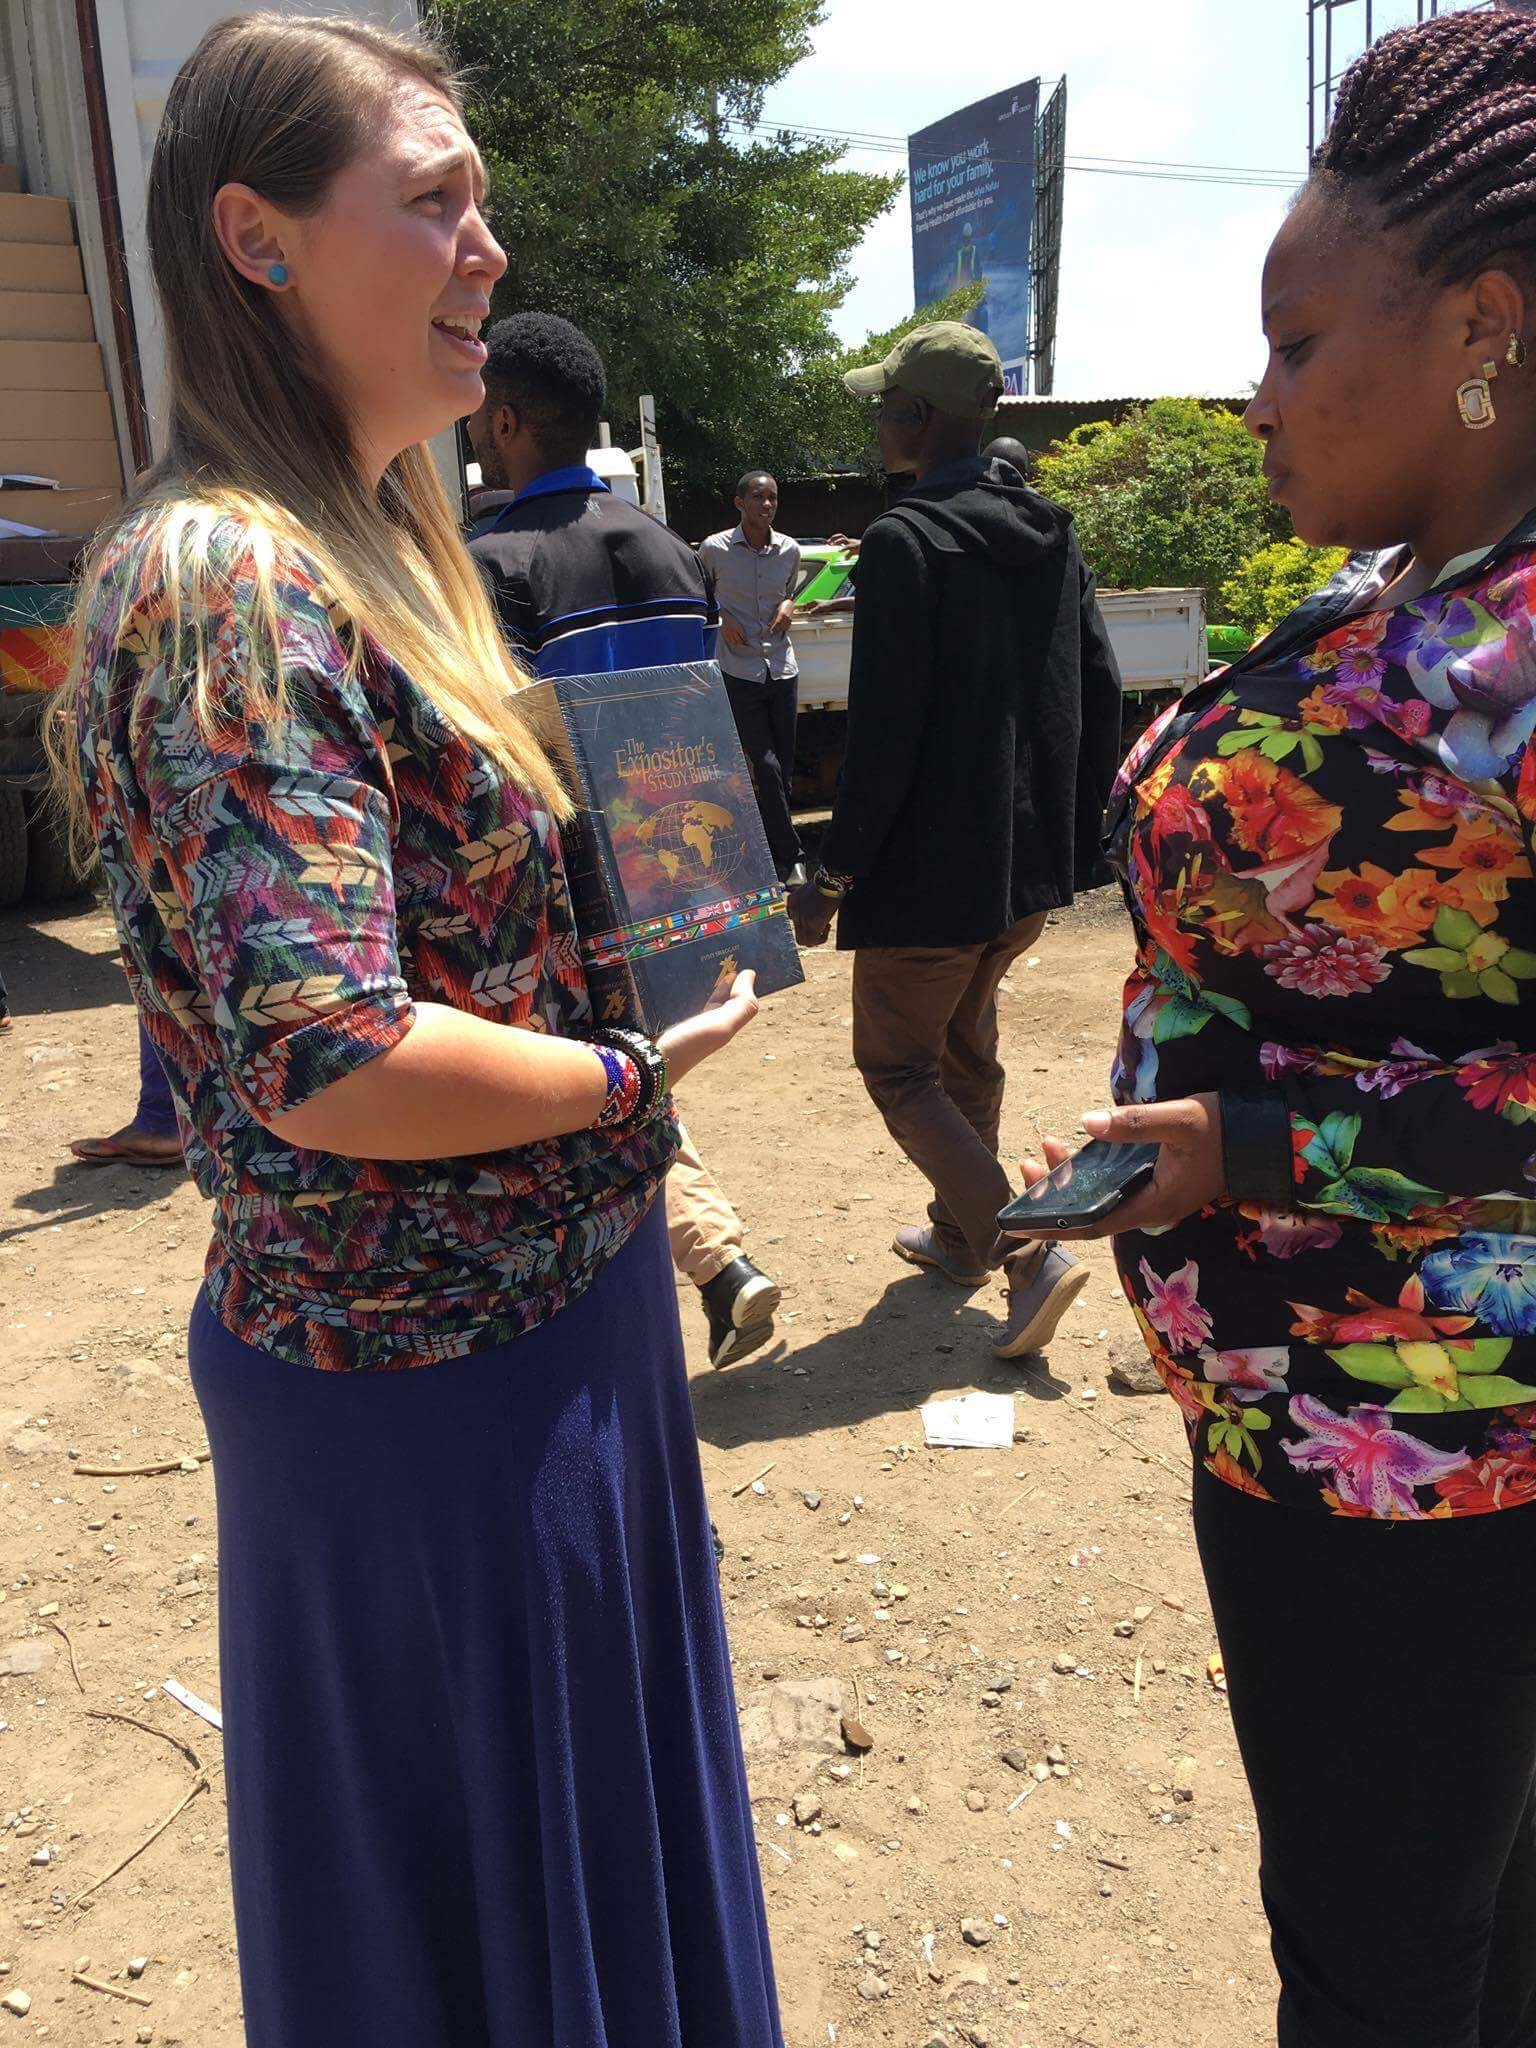 barbier-ministries   Bible Distribution